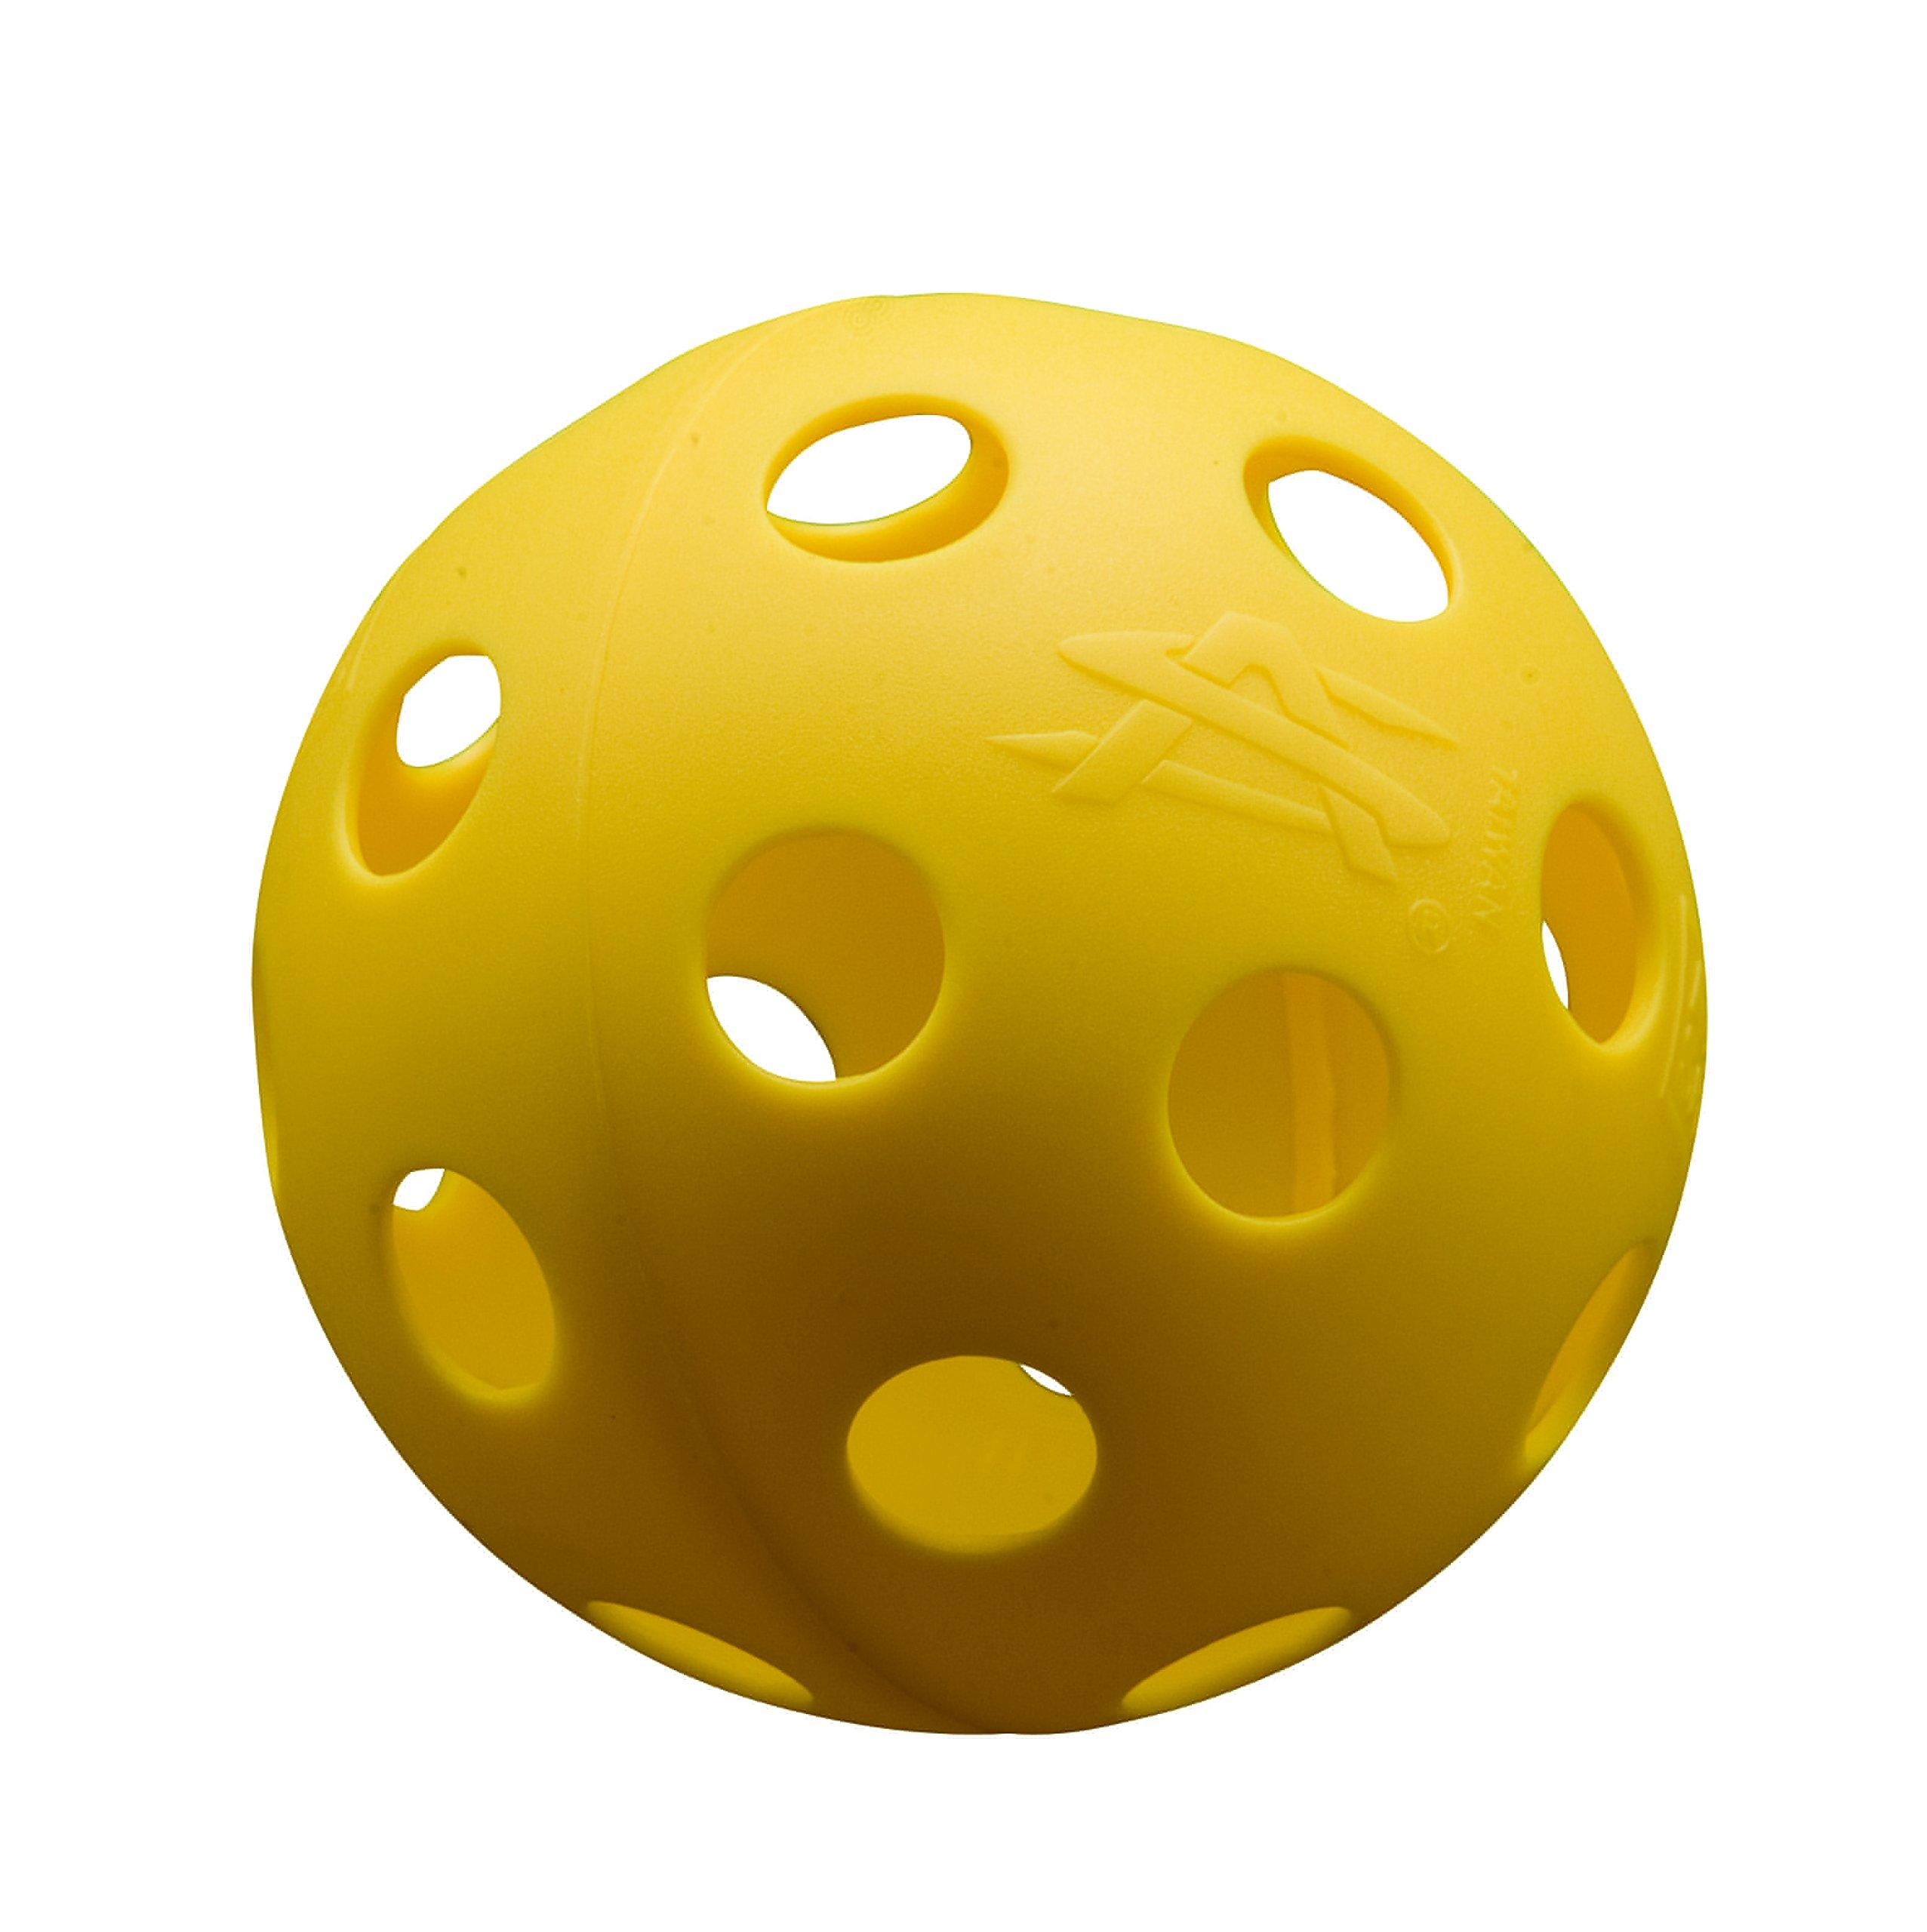 Athletic Specialties Perforated Baseballs Box of 100 Yellow by Athletic Specialties